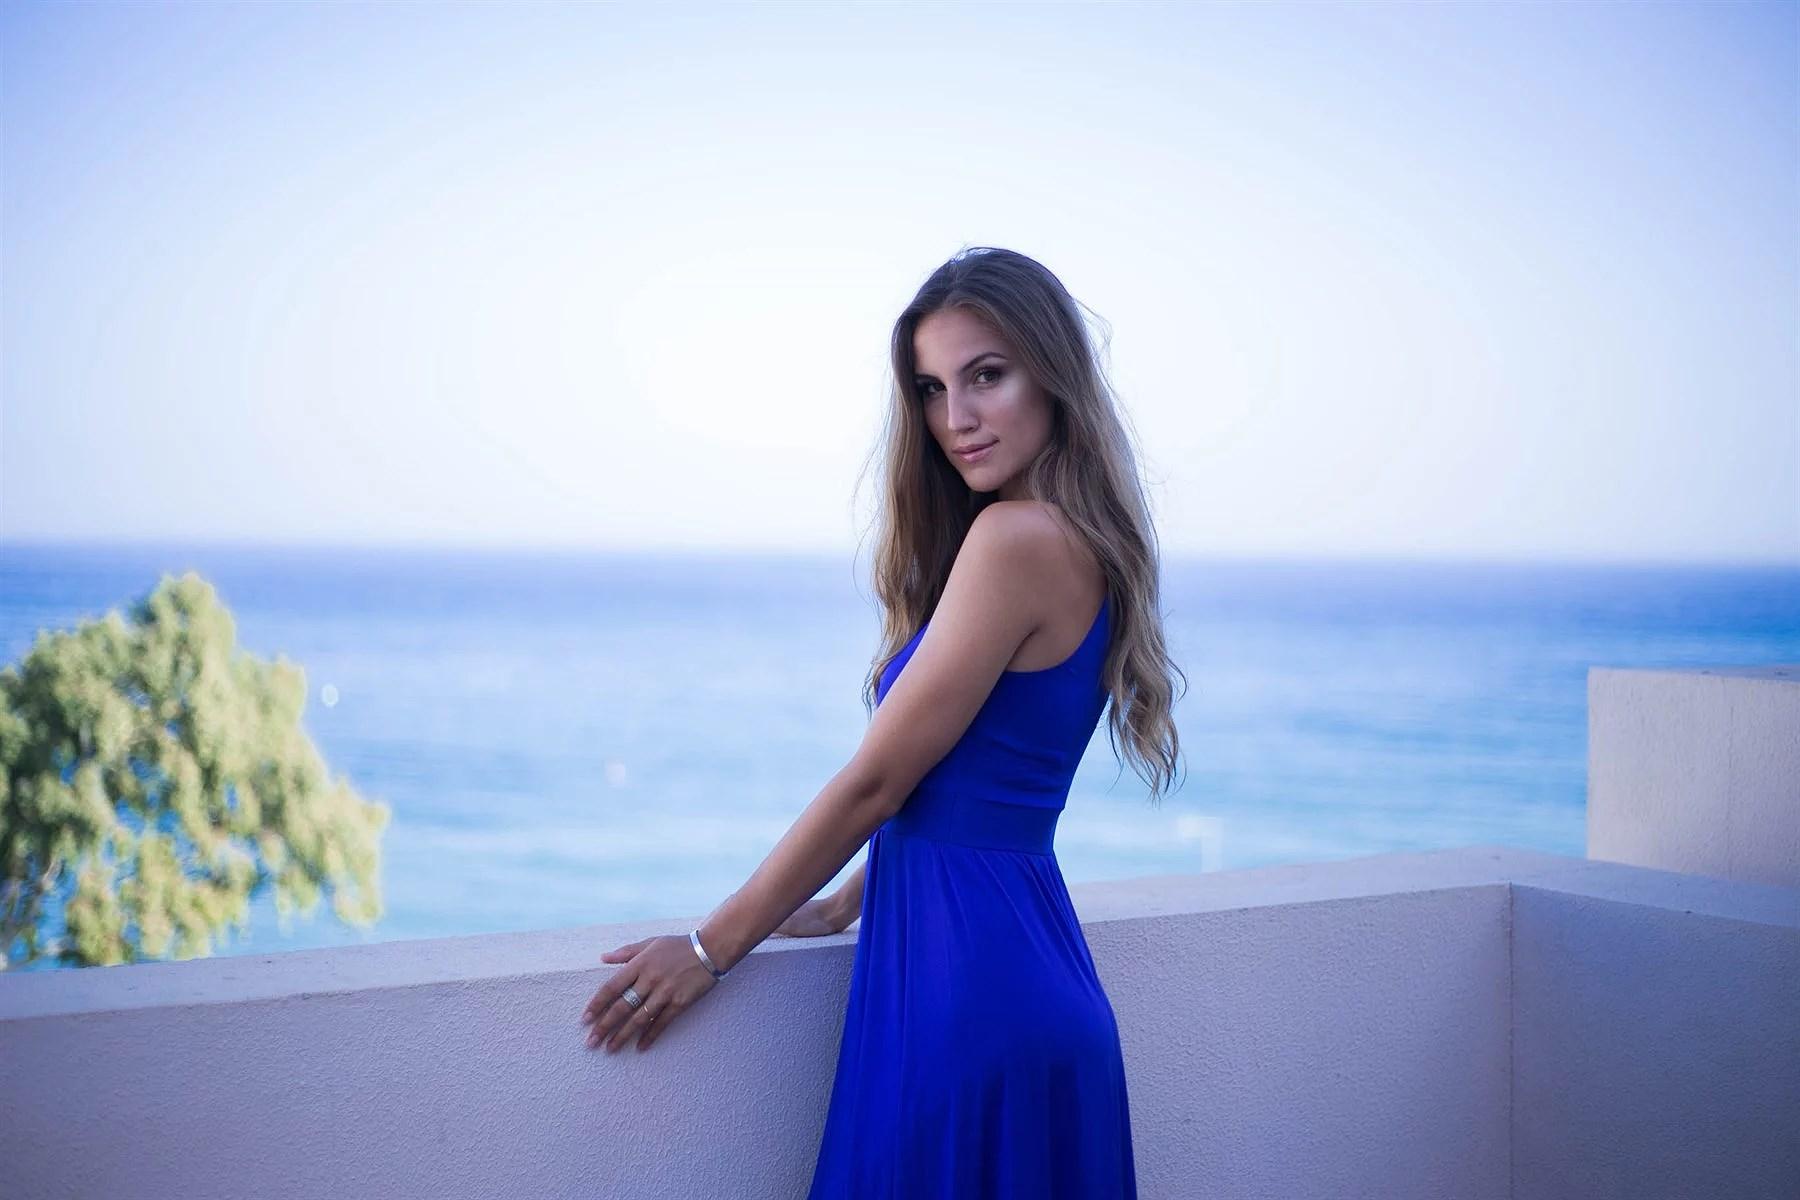 bluedress (1 of 1)-2